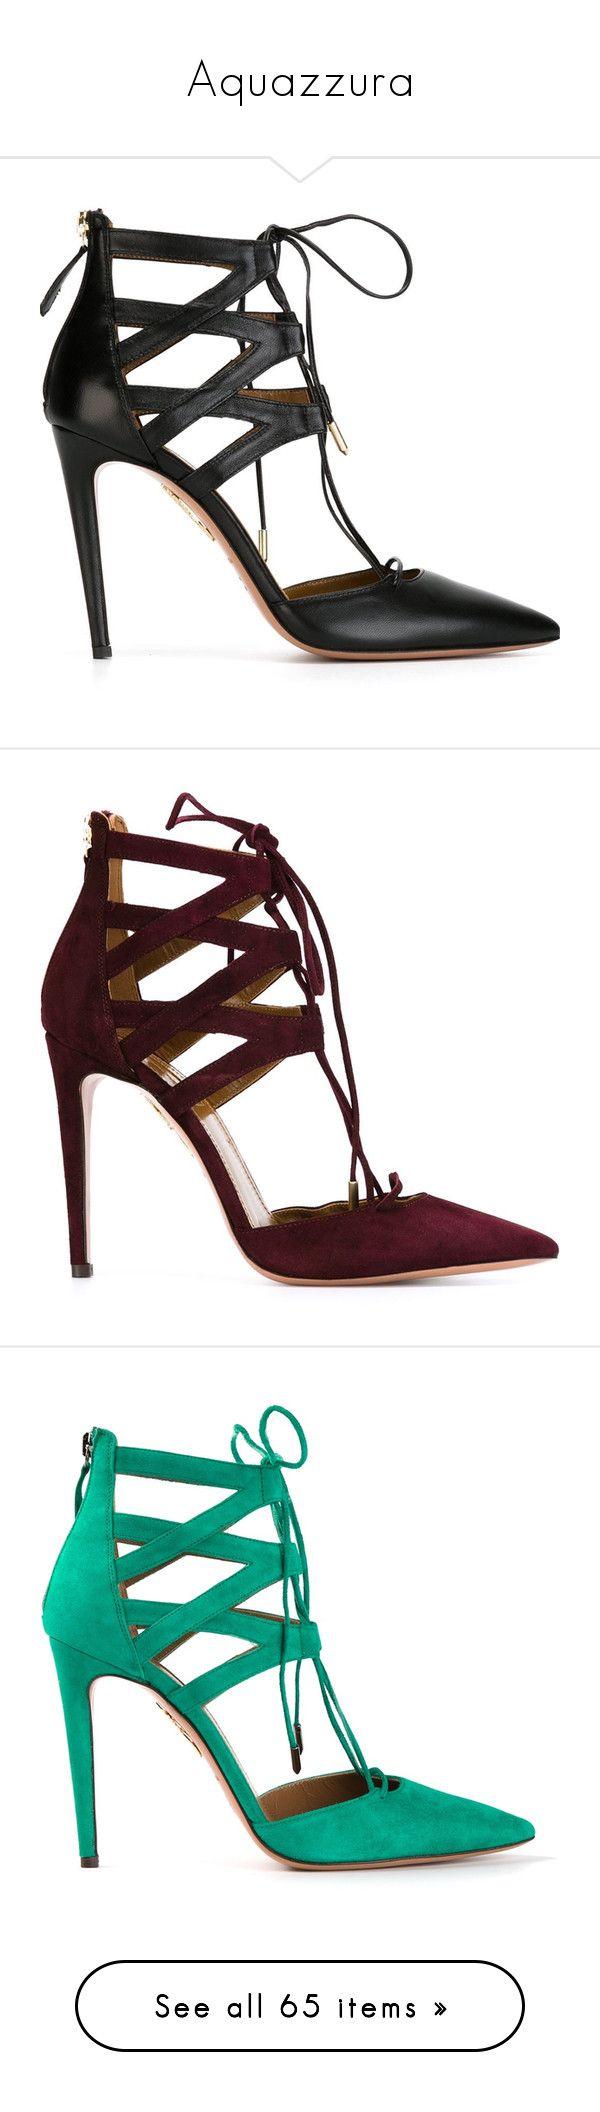 """Aquazzura"" by katiasitems on Polyvore featuring shoes, pumps, heels, aquazzura, saltos, black, heels stilettos, black stiletto pumps, lace up pumps and black stilettos"